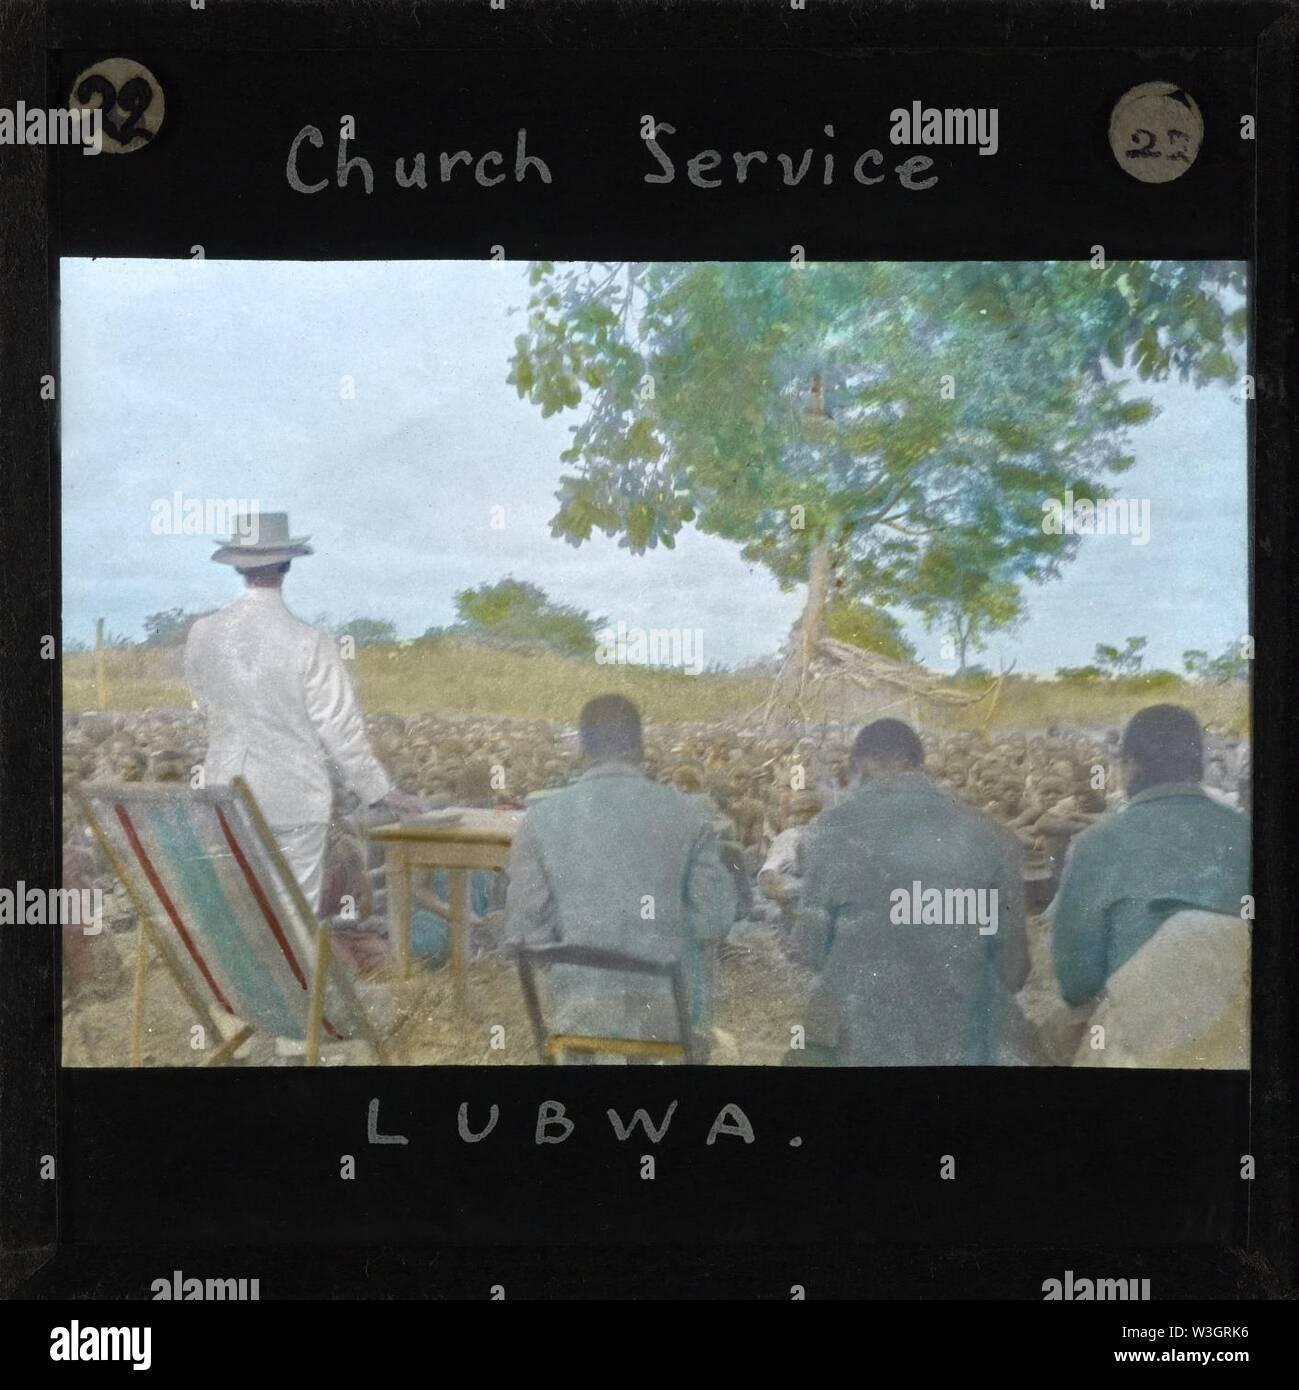 Church Service, Lubwa, Zambia, ca.1905-ca.1940 (imp-cswc-GB-237-CSWC47-LS6-022). - Stock Image